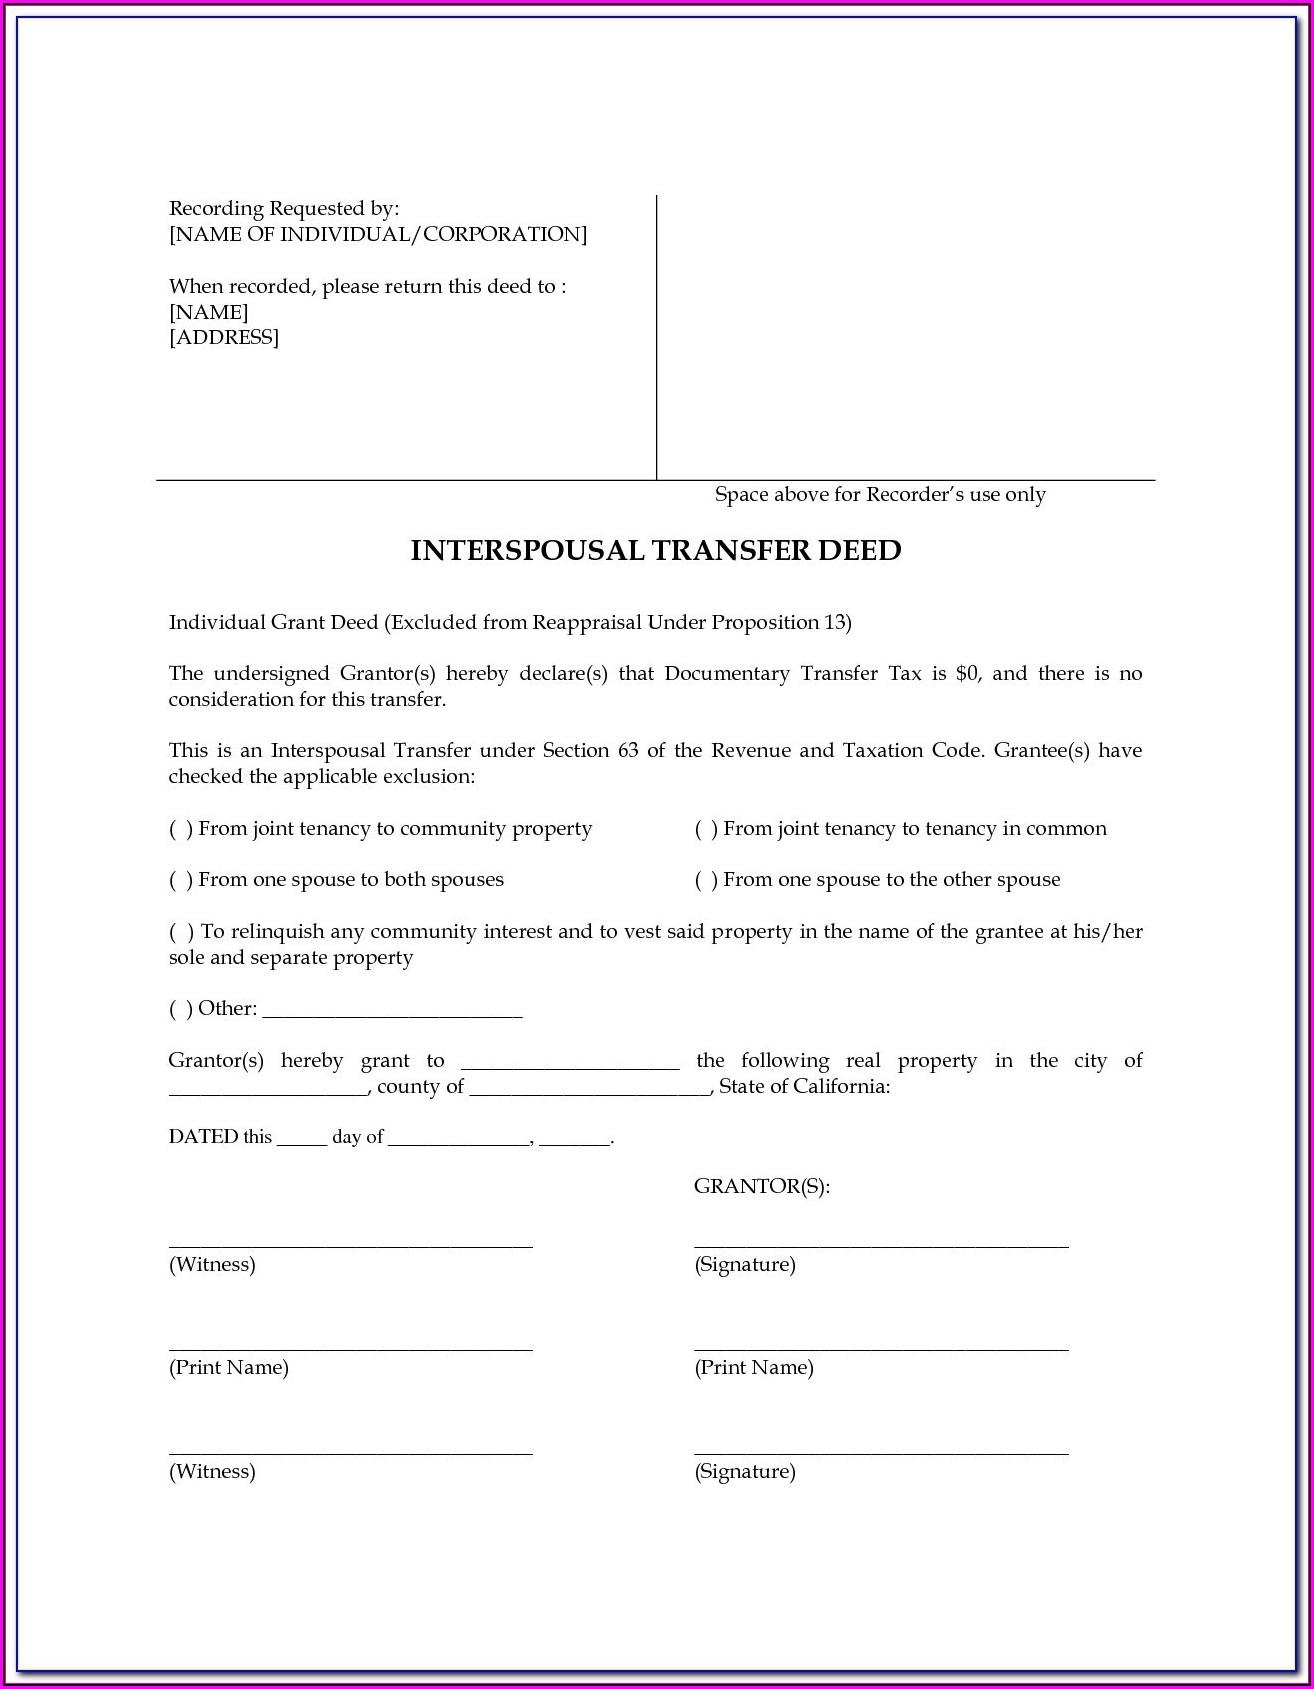 Interspousal Transfer Deed Form Texas